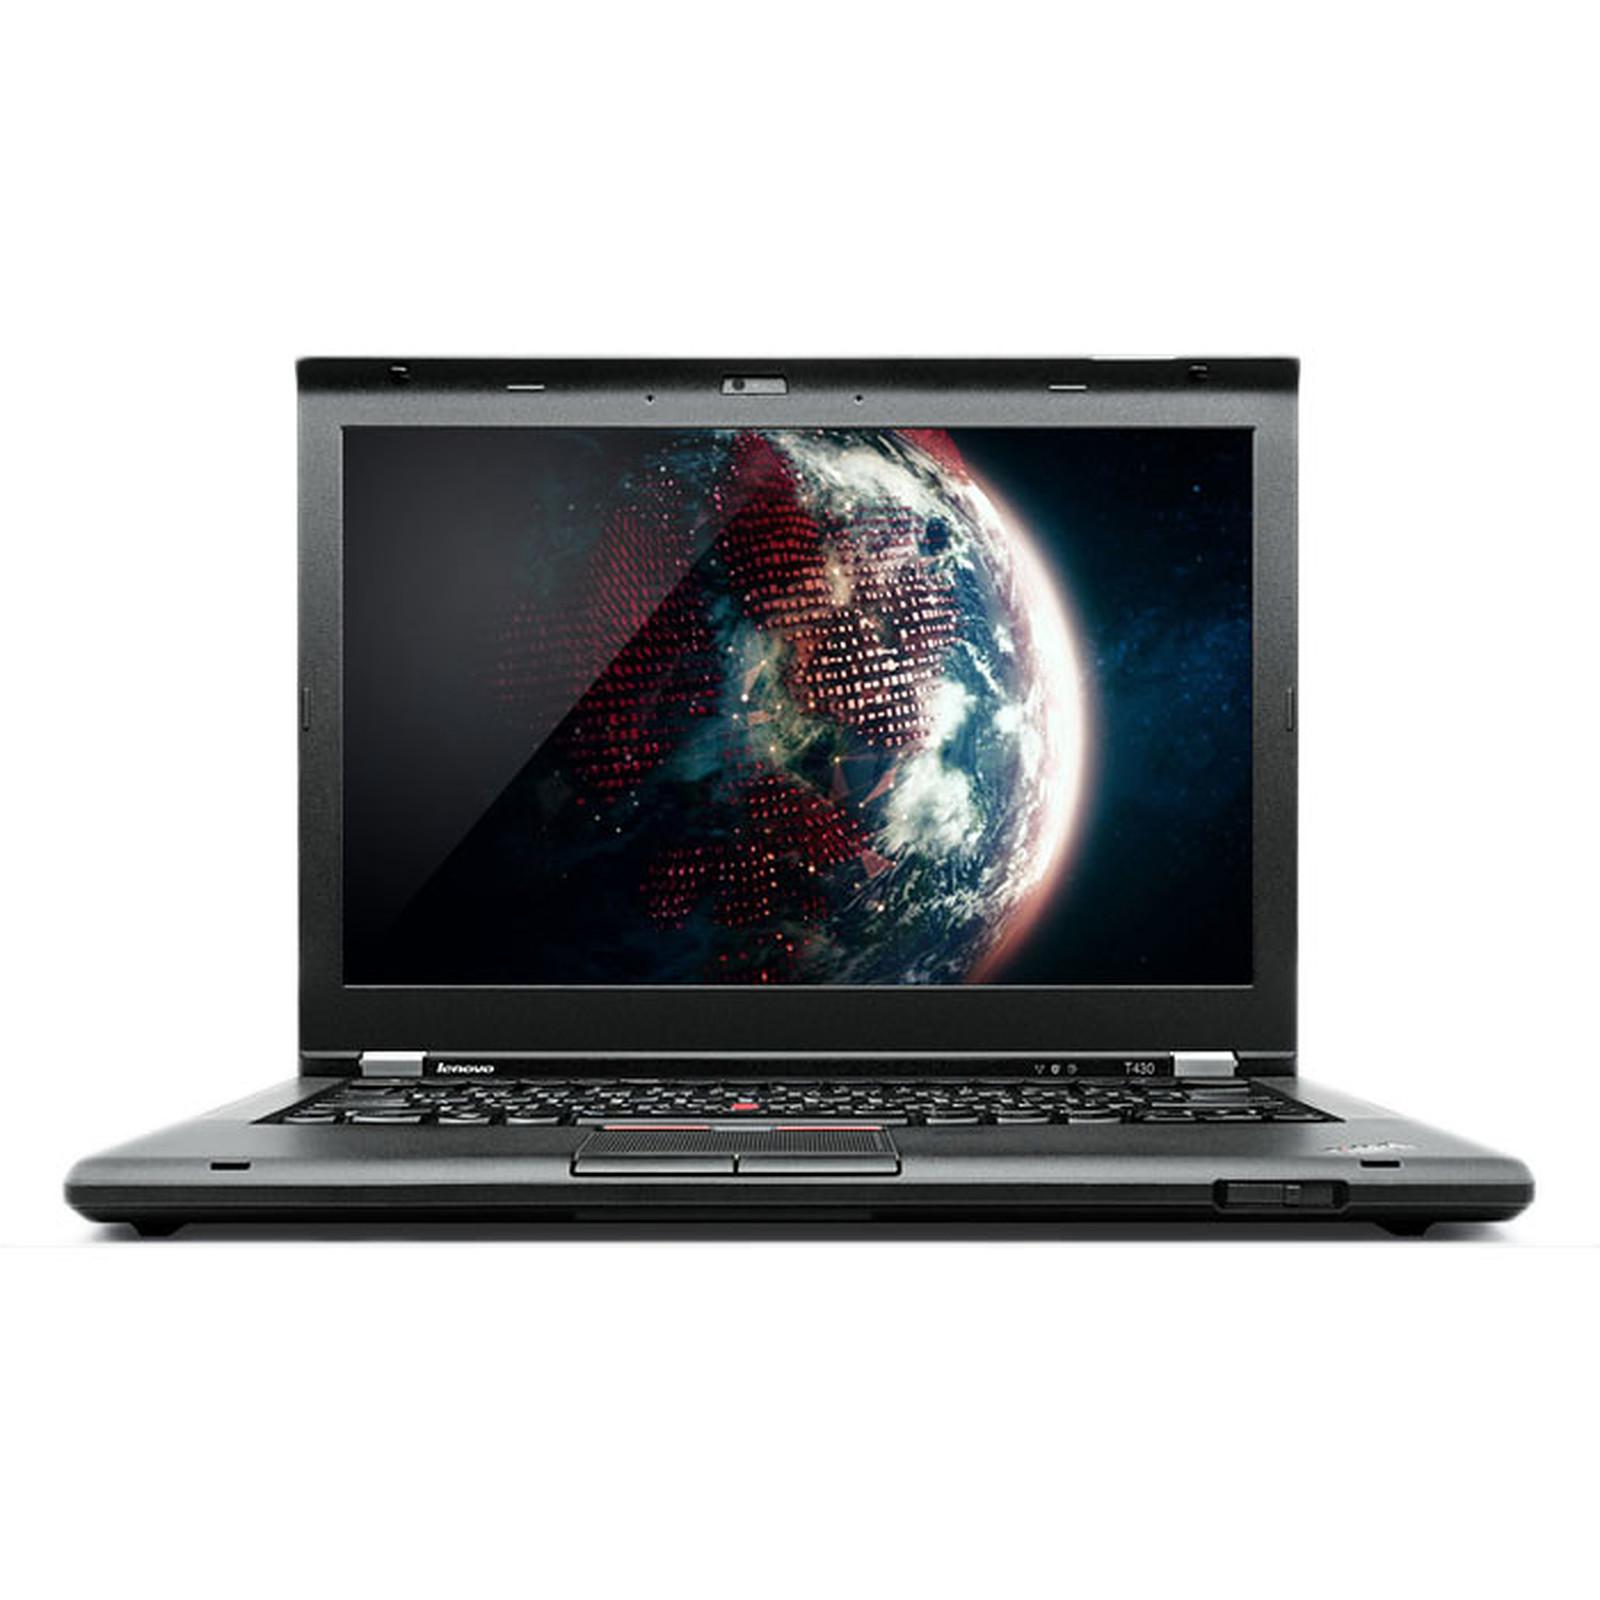 Lenovo ThinkPad T430 (N1XKAFR)